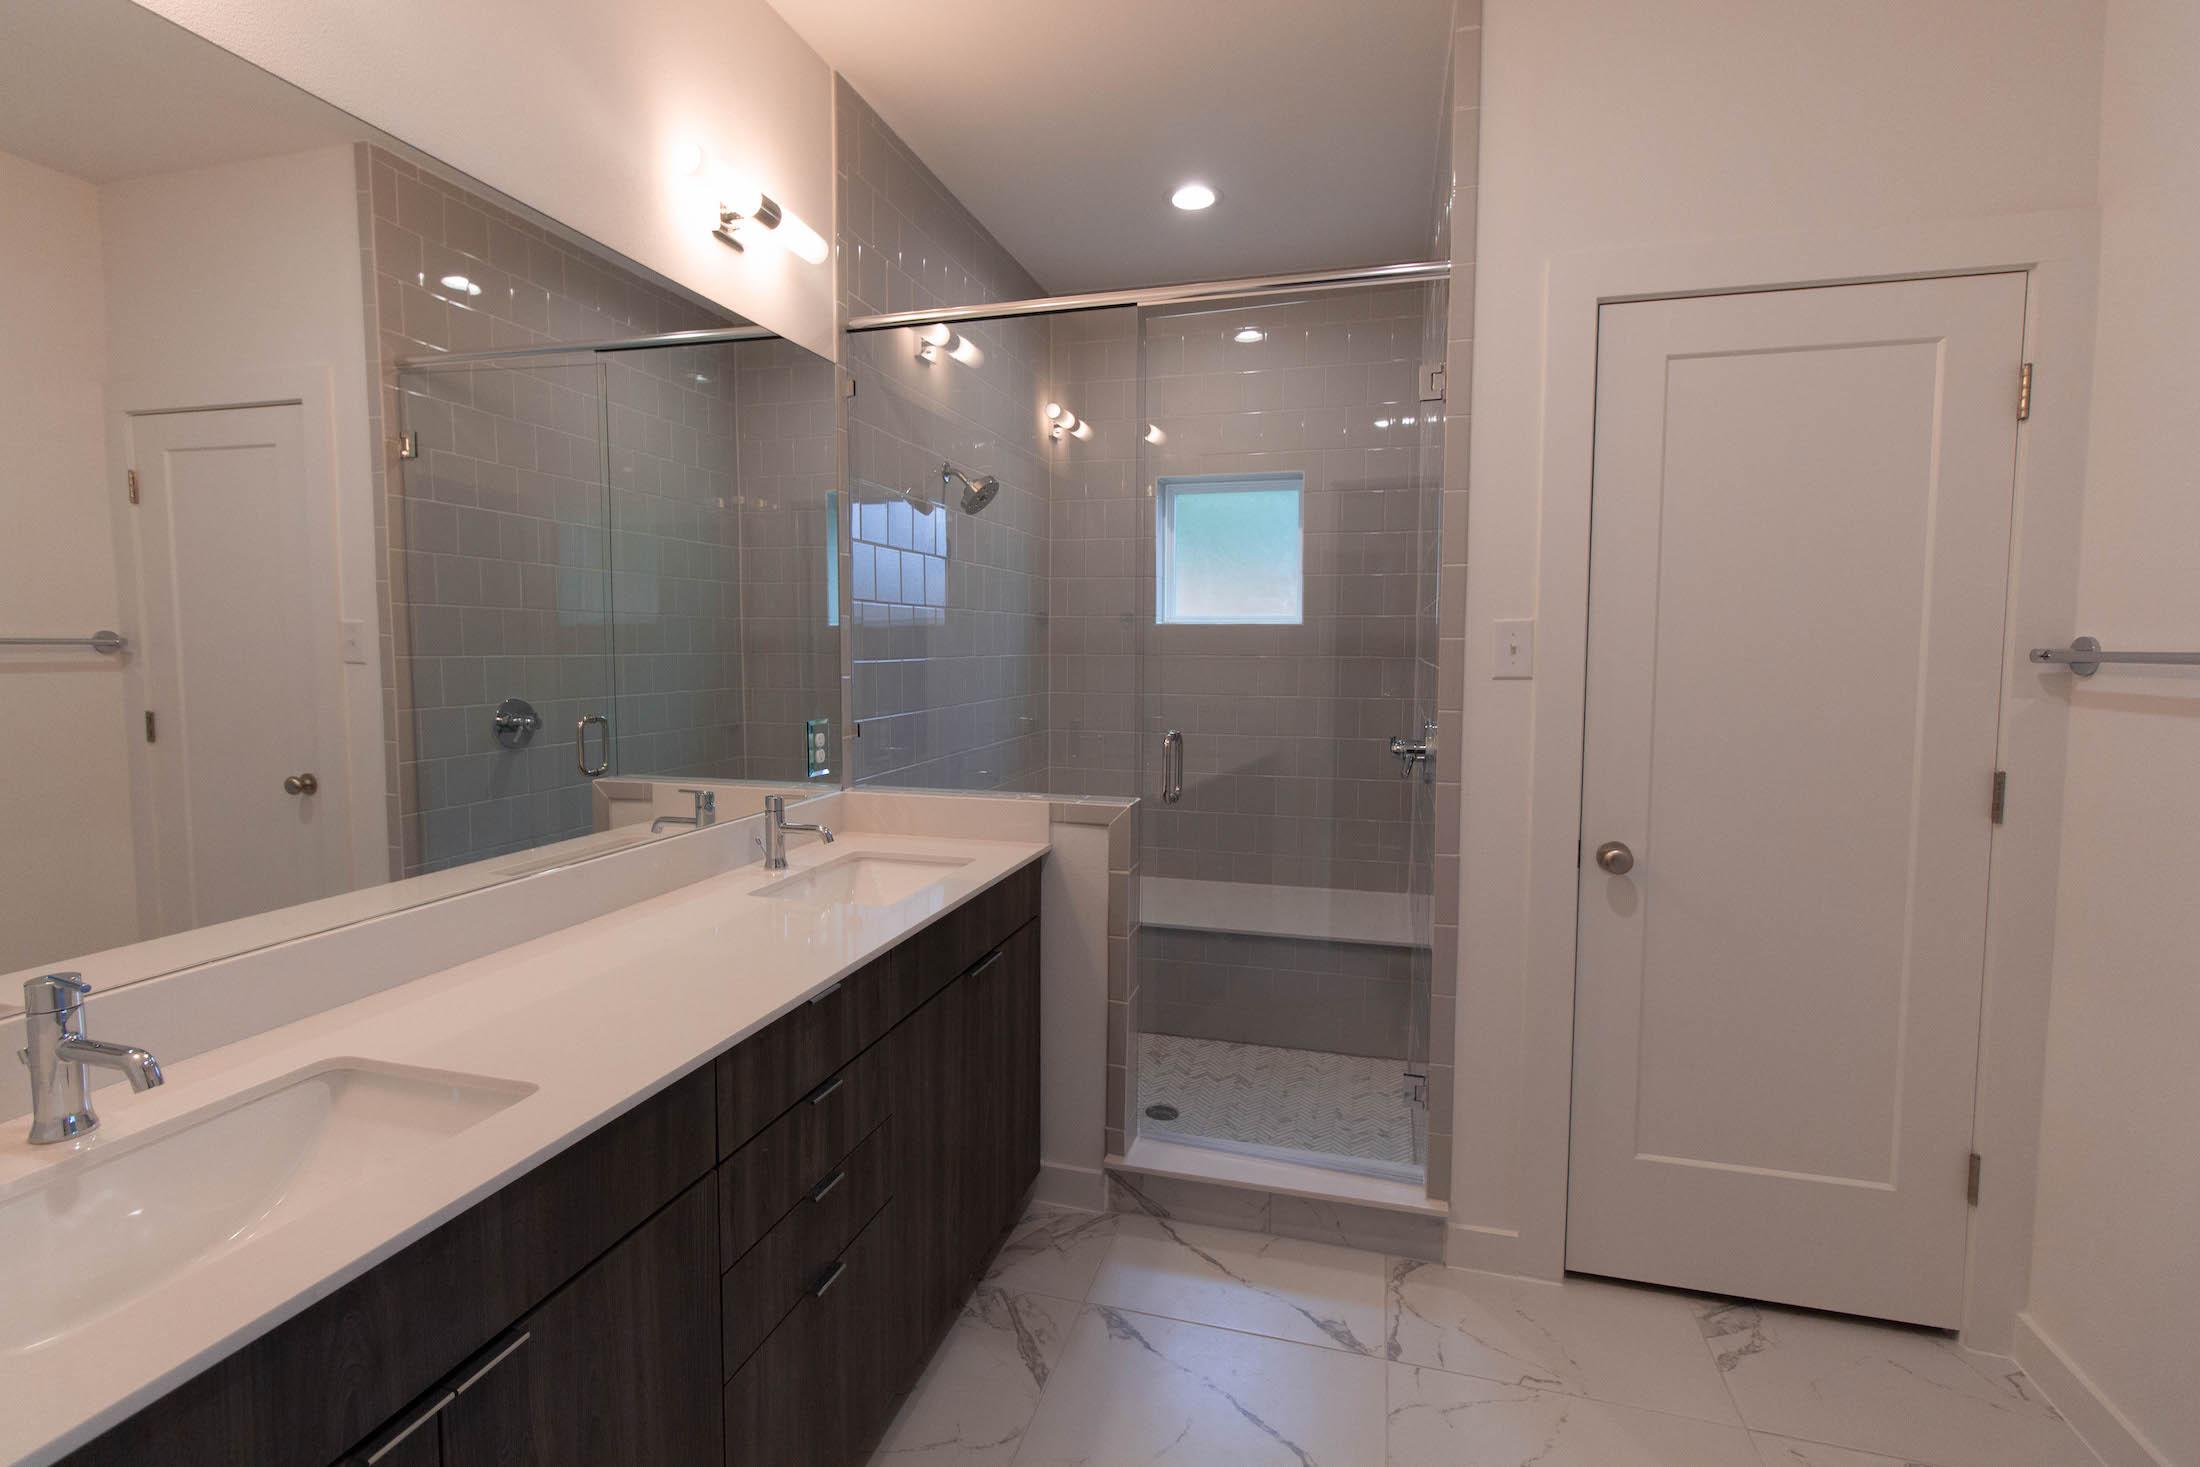 Bathroom Design (Custom Home Design): master bathroom vanity and walk in shower